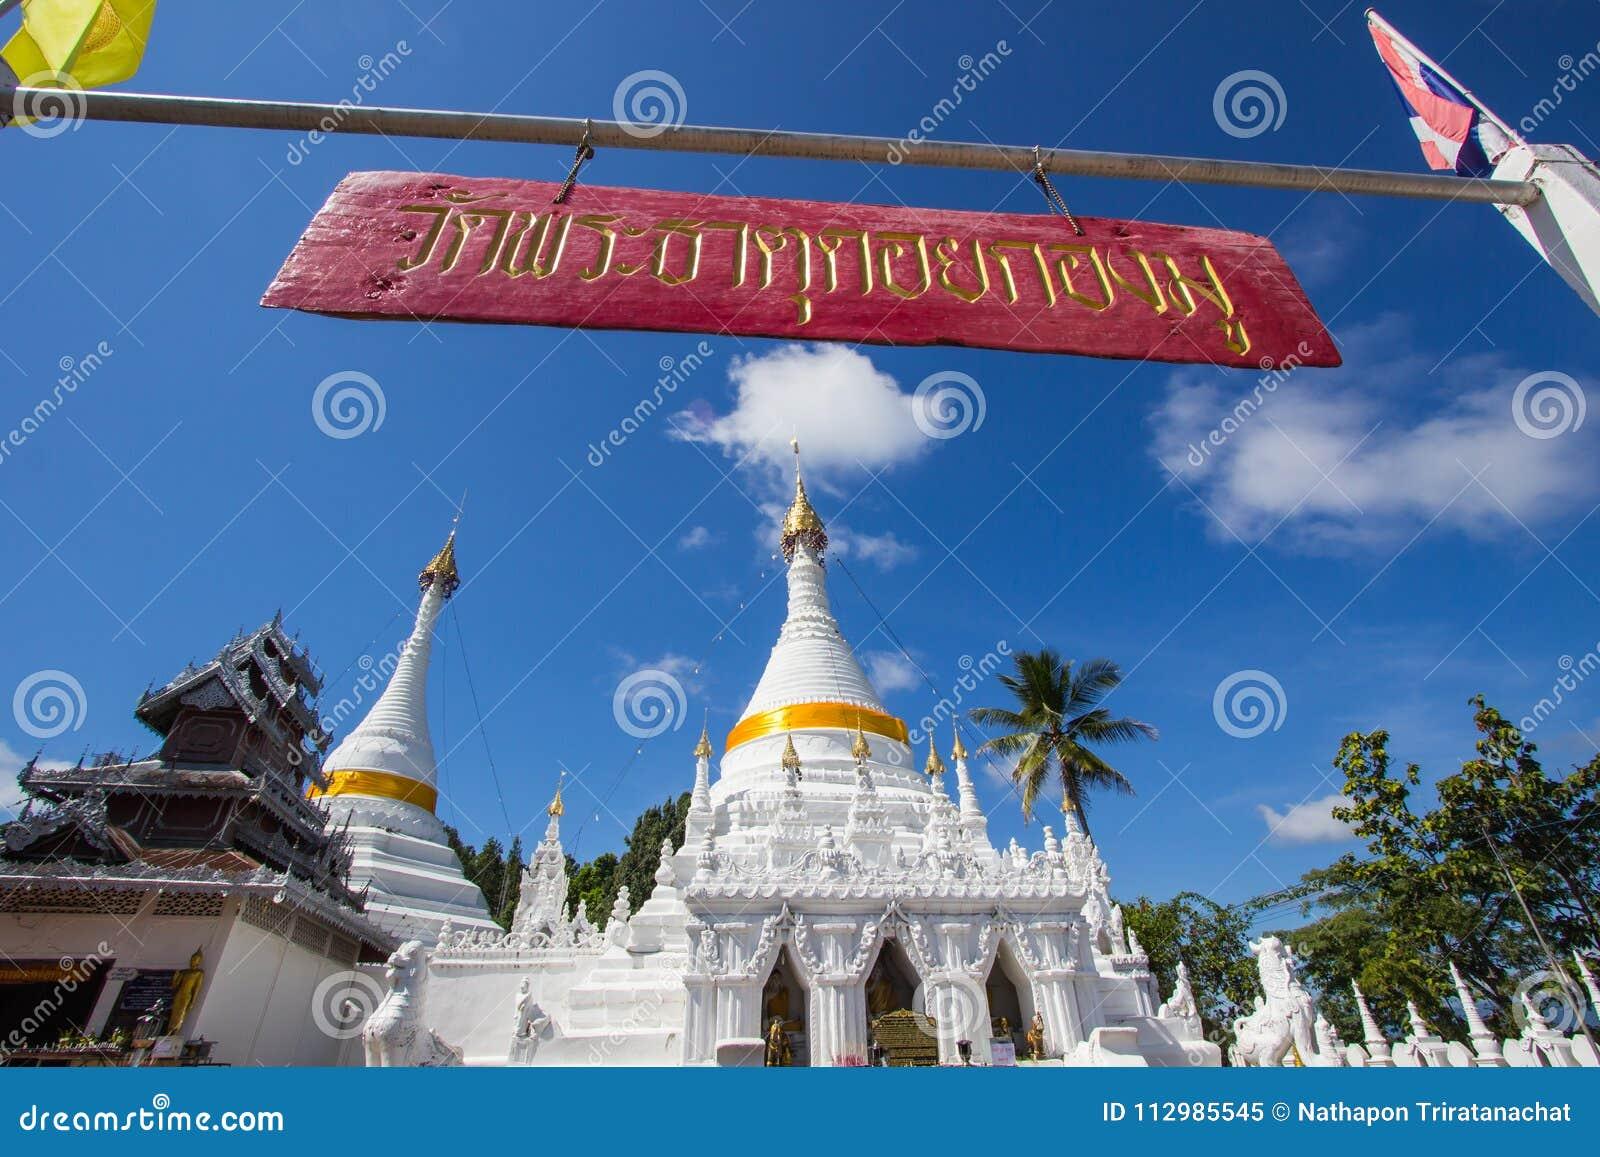 Mae Hong Son province,Northern Thailand on November 19,2017: Burmese style white chedis with beautiful sky at Wat Phra That Doi Ko